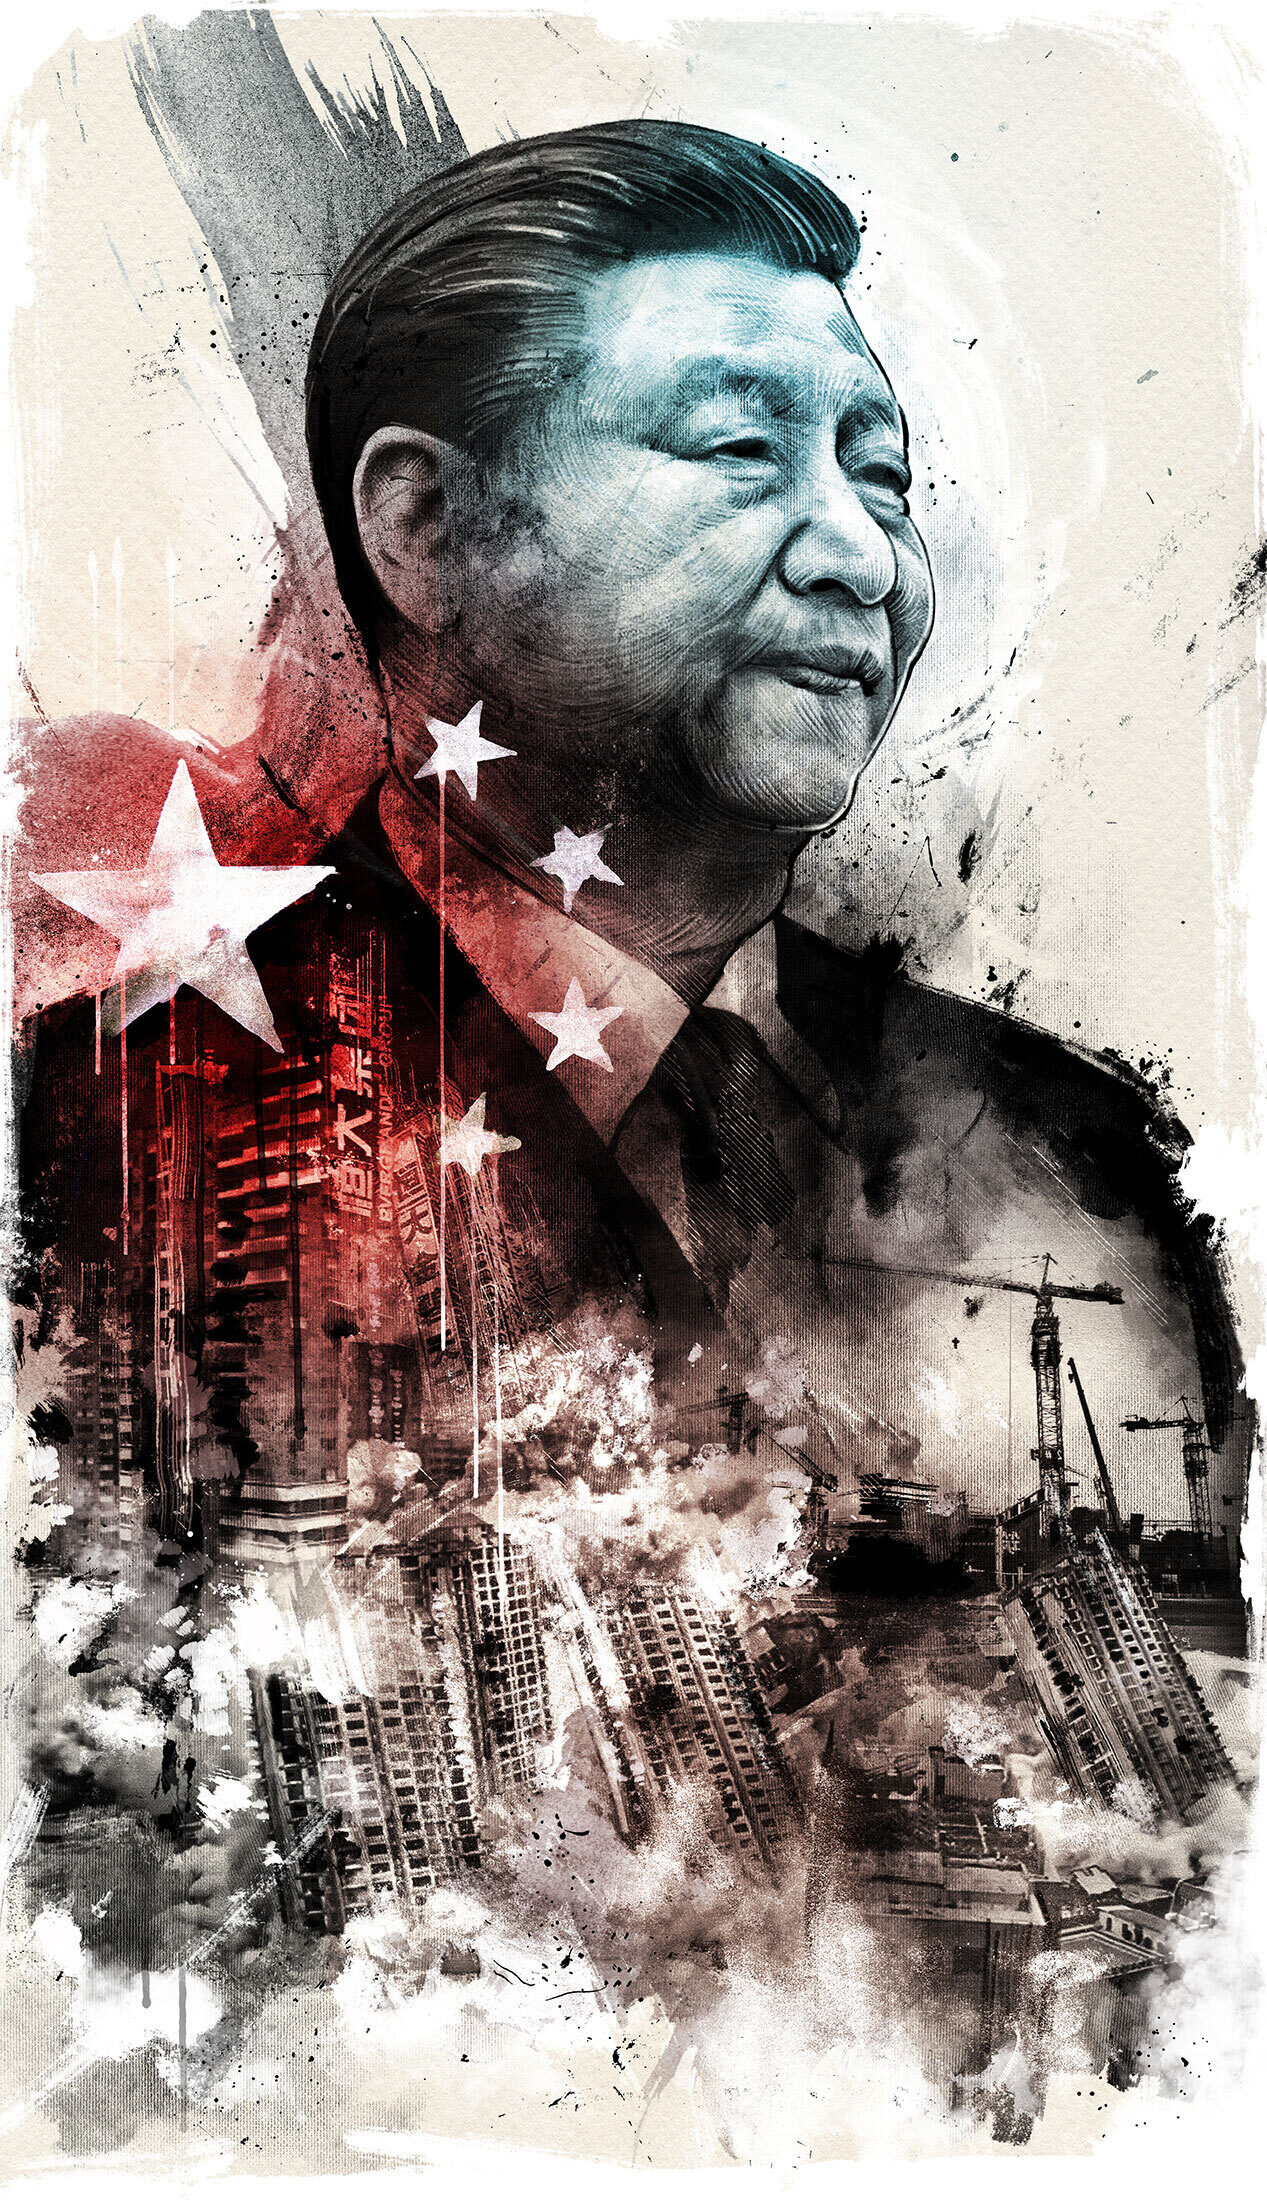 China editorial Xi Jinping Evergrande illustration investment capitalism - Kornel Illustration   Kornel Stadler portfolio